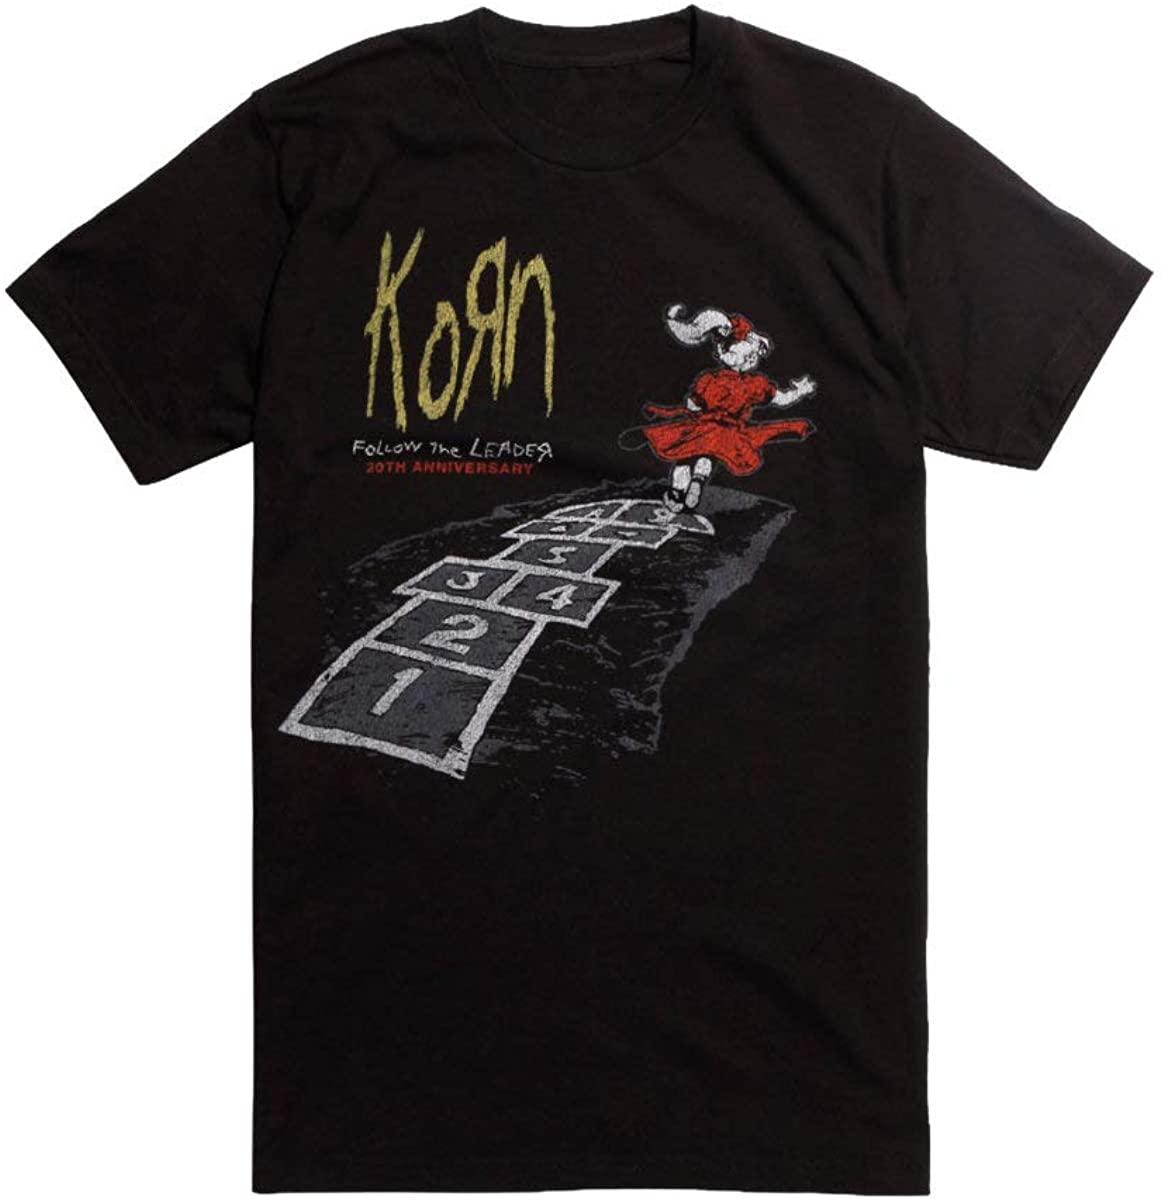 Hot Topic Korn Follow The Leader 20th Anniversary T-Shirt Black